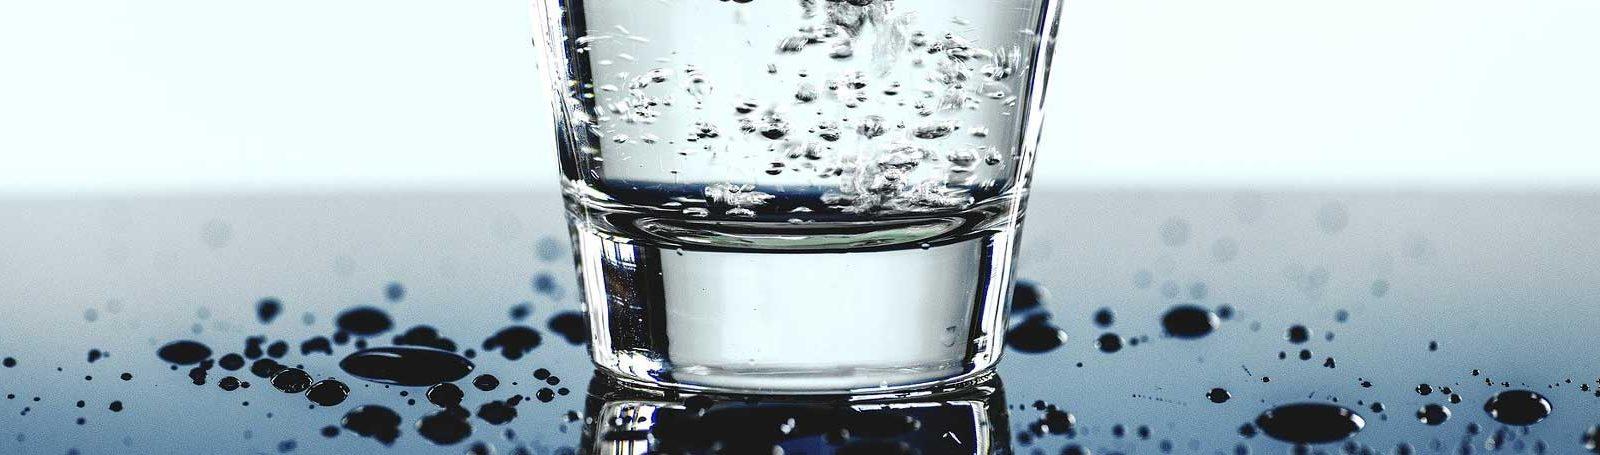 Darling Irrigation Water Filtration